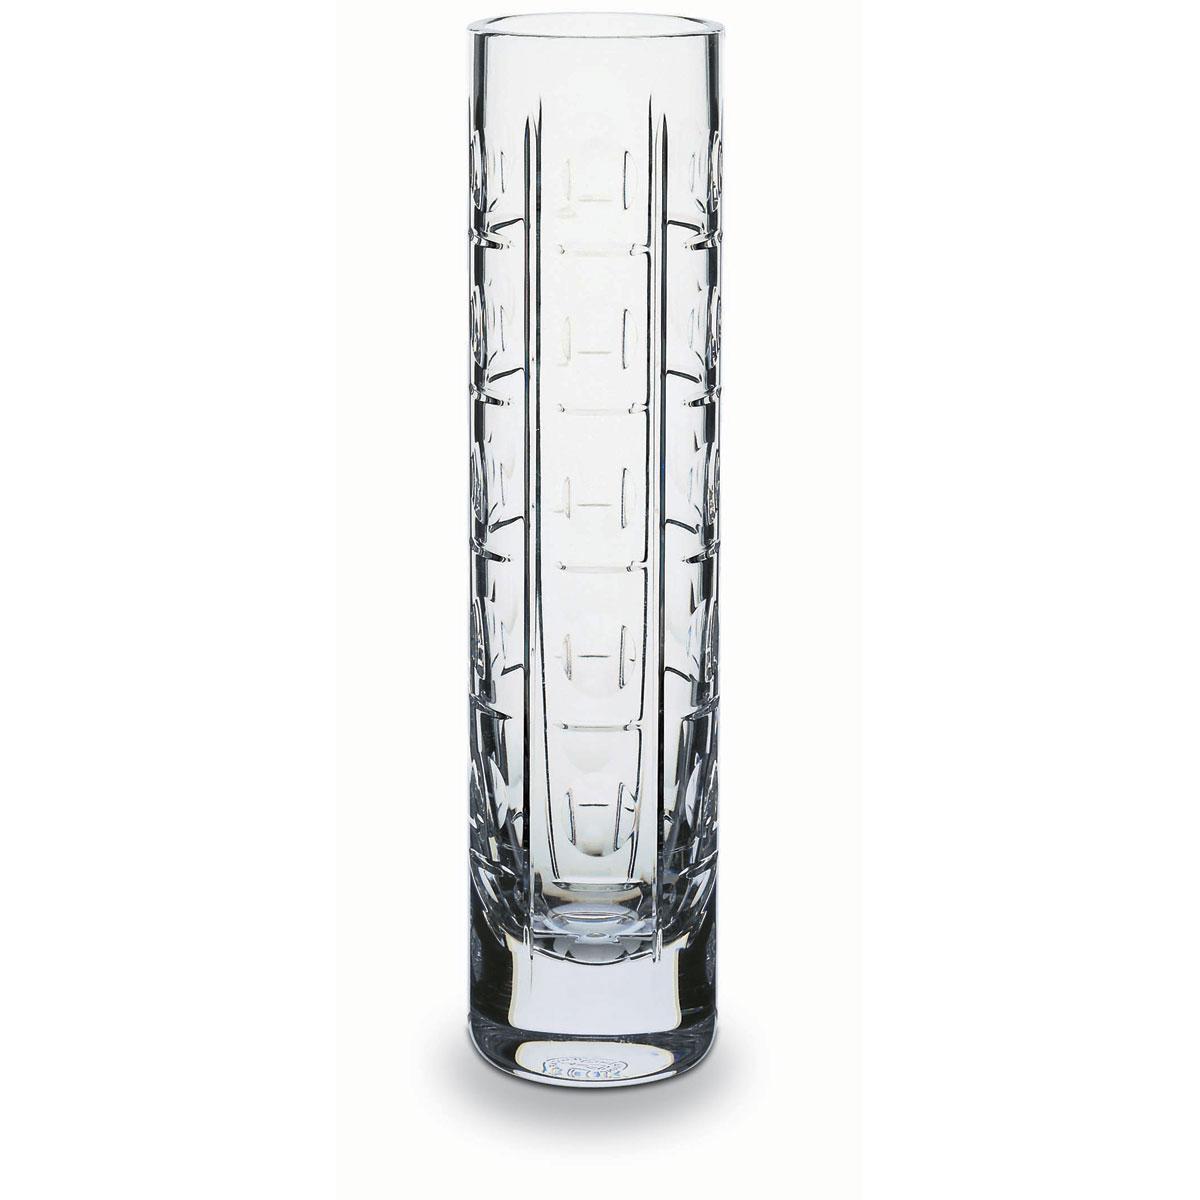 Baccarat Crystal, Equinoxe Bud Crystal Vase